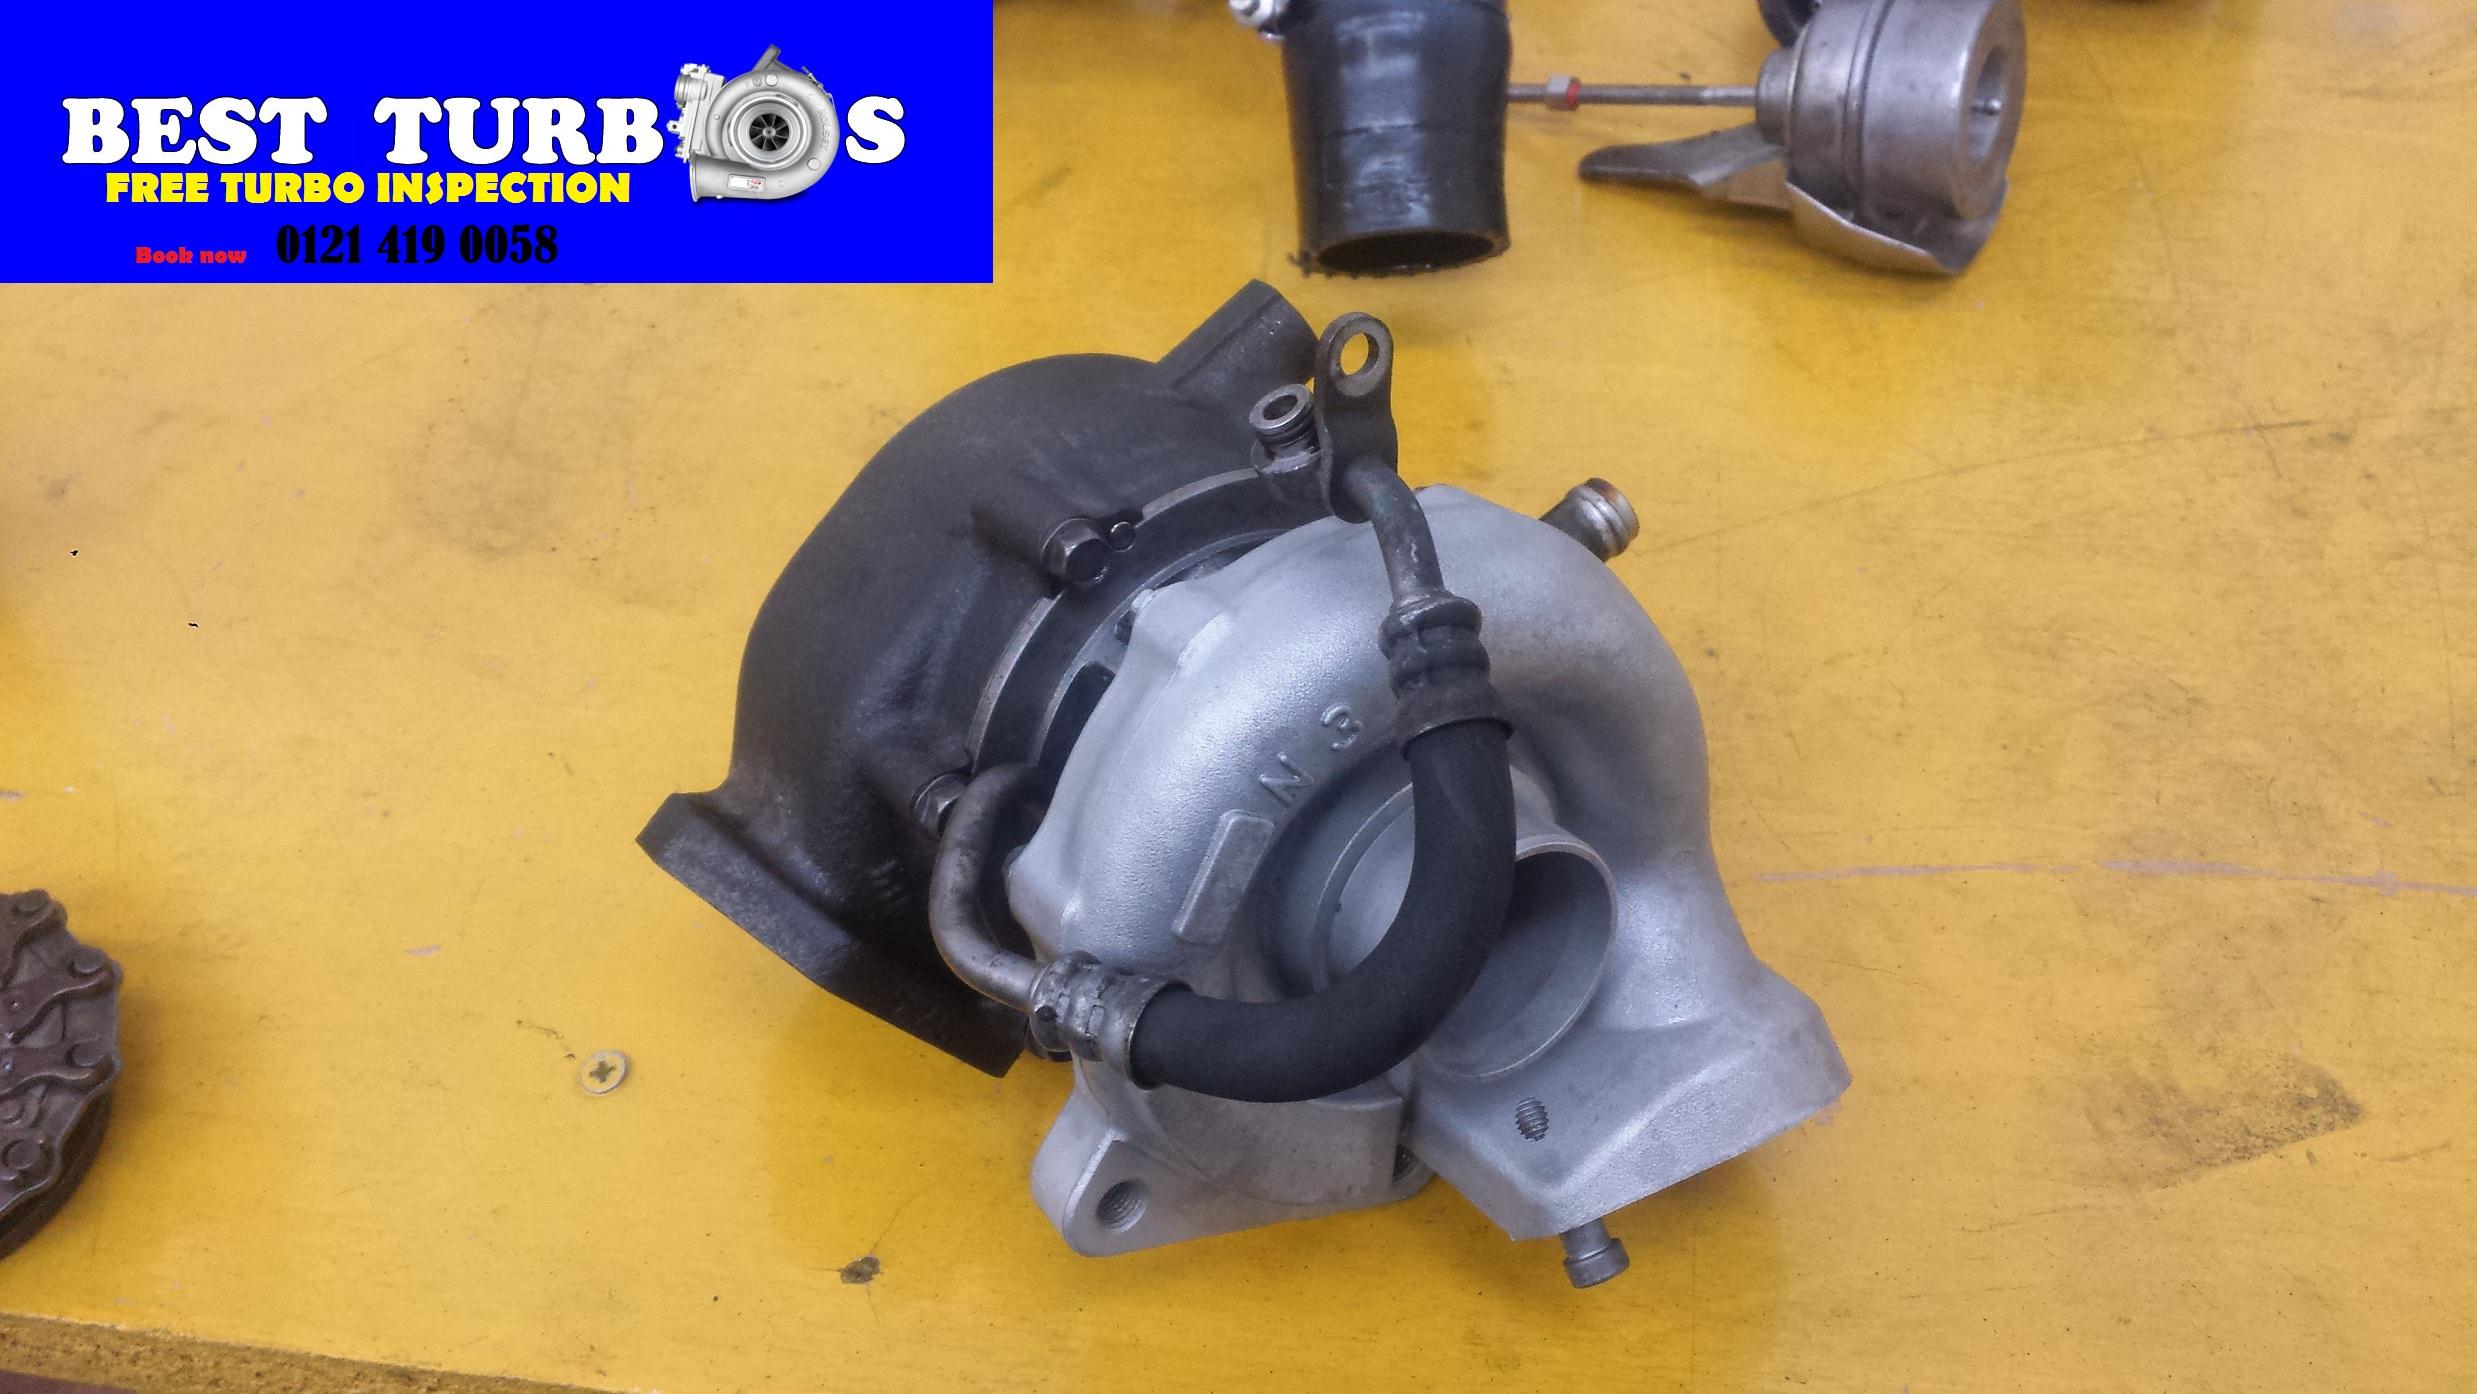 bmw 320d turbo reconditioning specialists best turbos birmingham west midlands wolverhampton walsall dudley erdington solihull sutton coldfield garret borg kkk GT1749V 717478 GT1749V 750431 GT2256V 454191